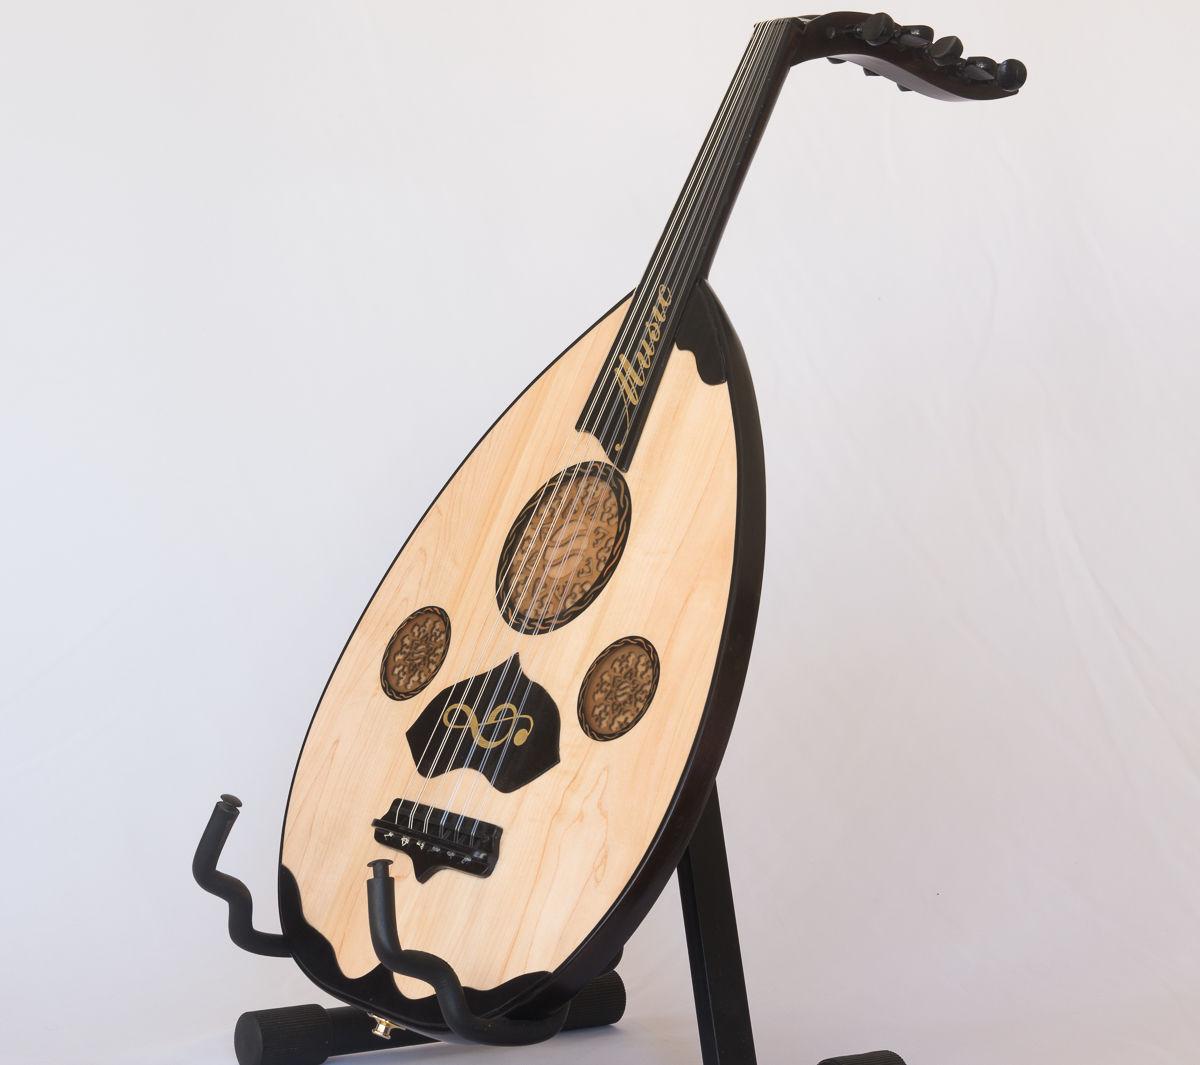 Concert grade Electric Arabic Oud